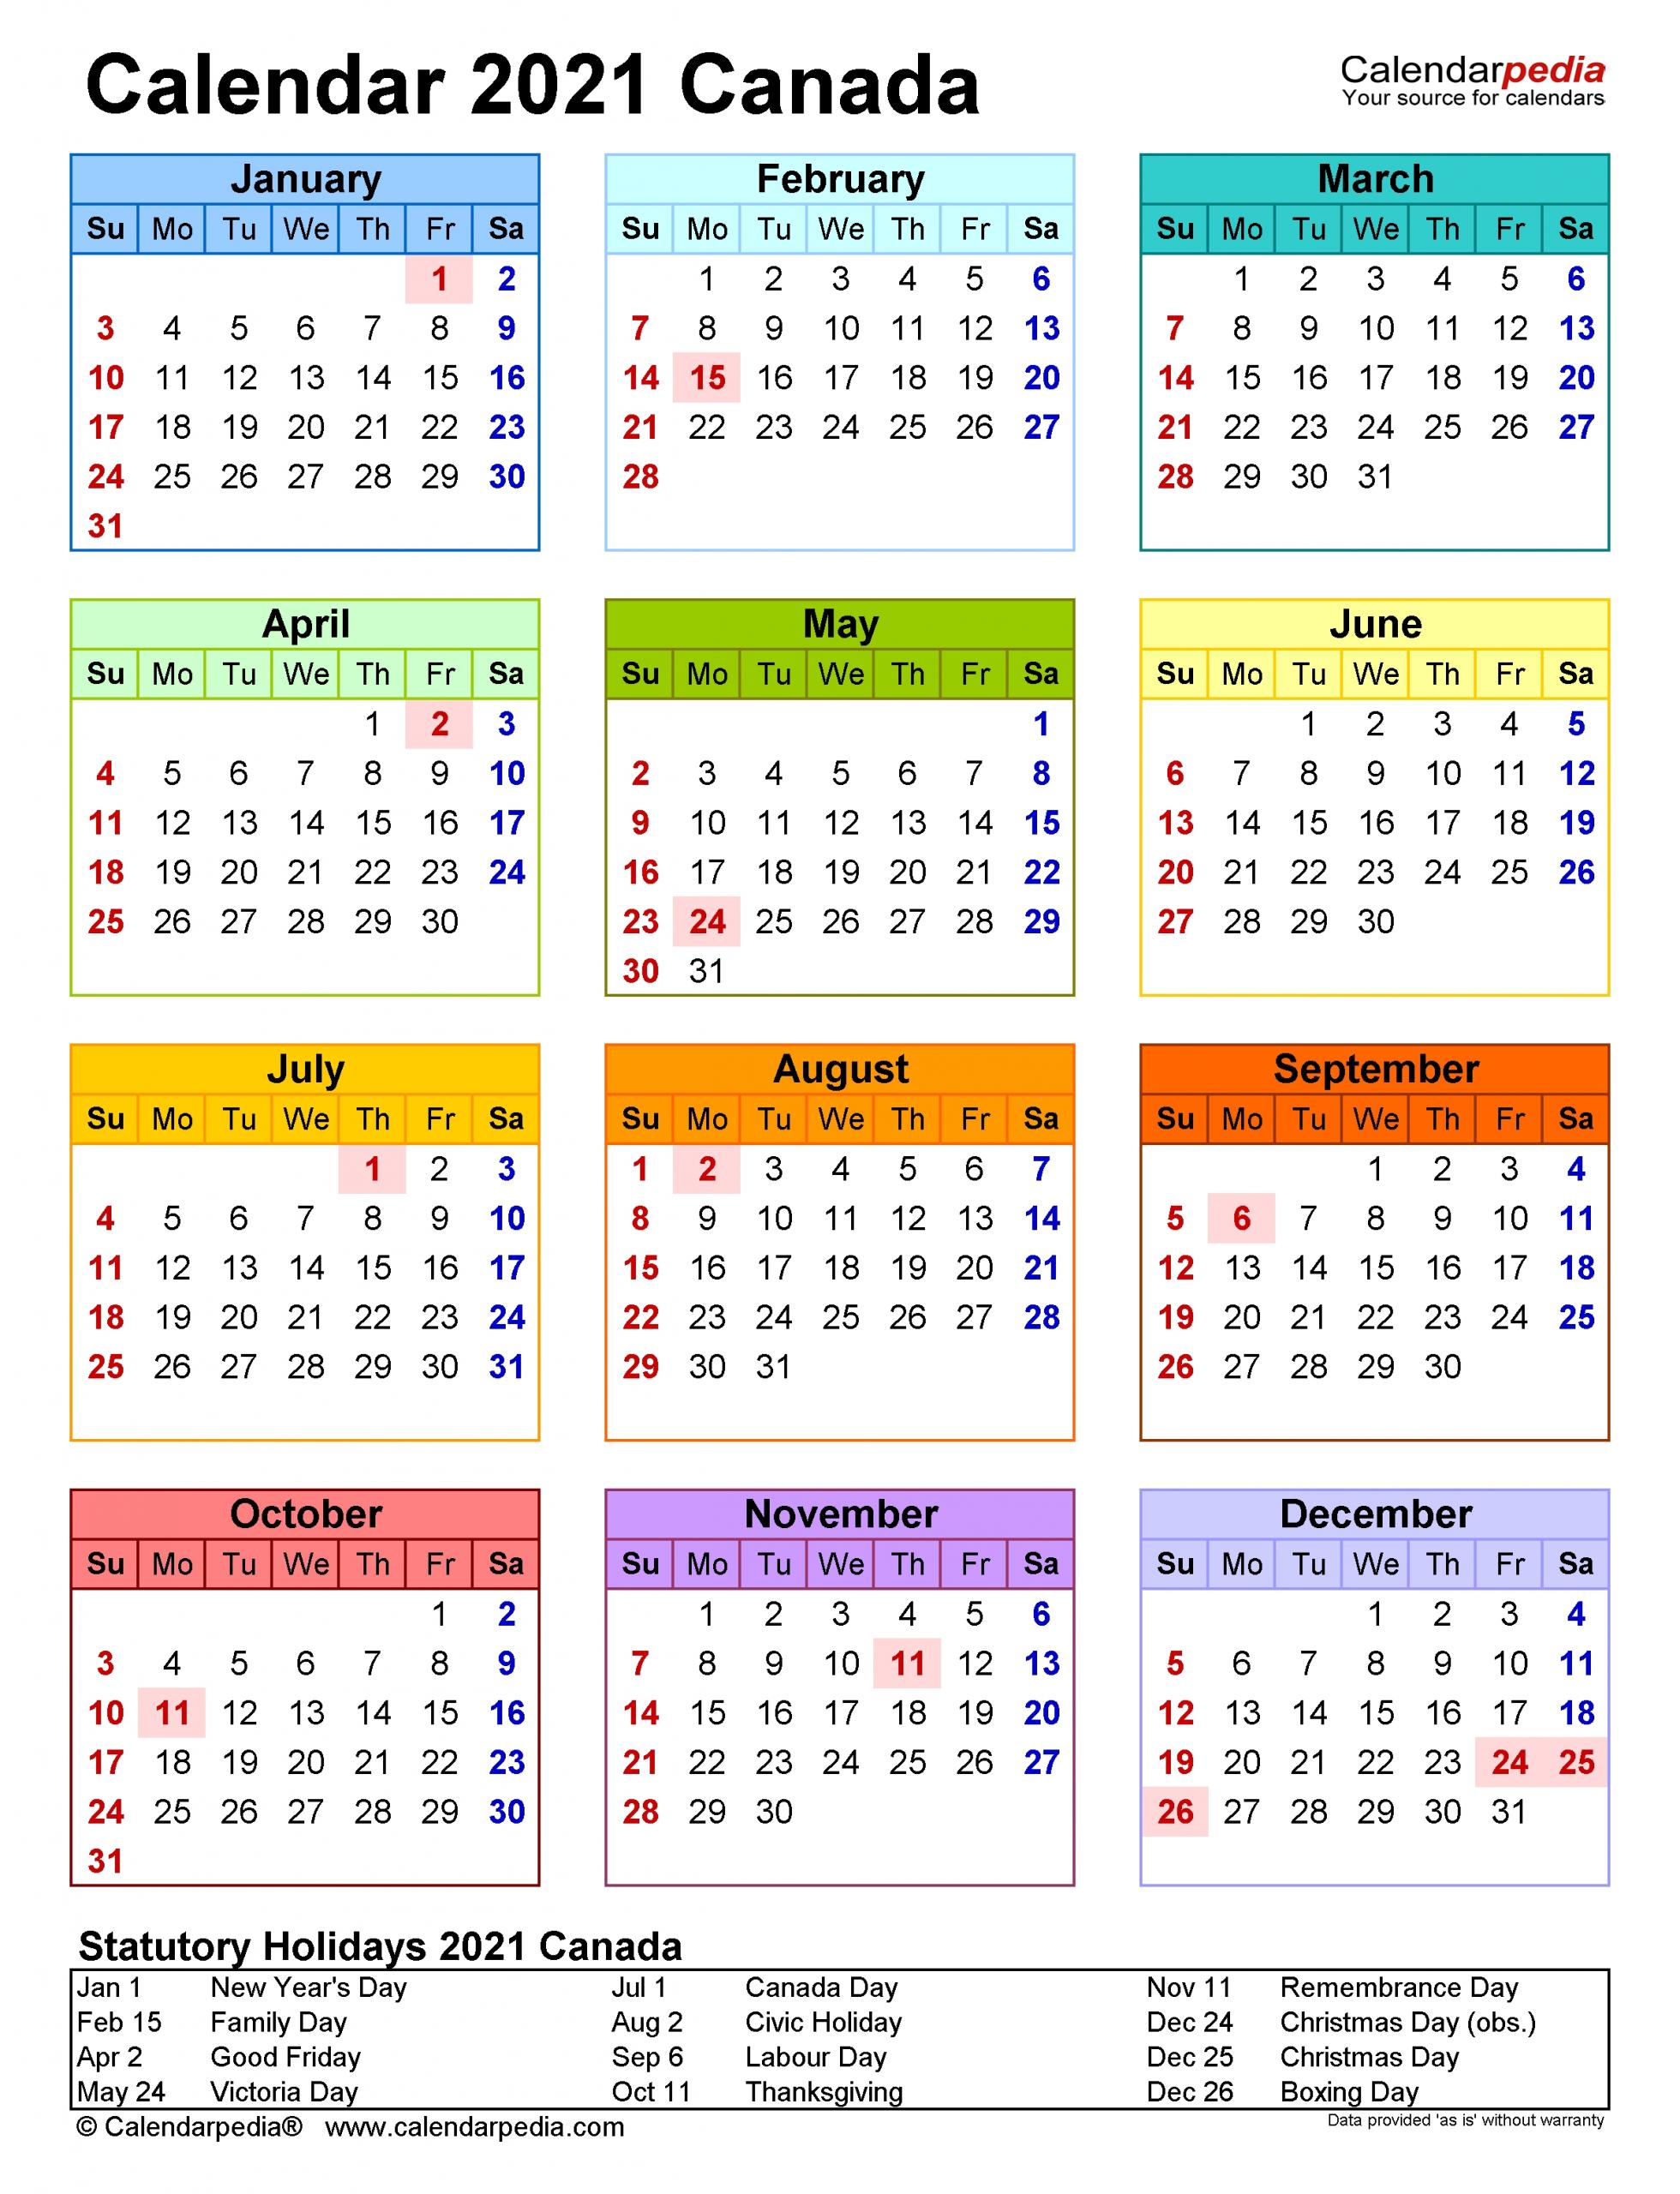 Canada Calendar 2021 - Free Printable Excel Templates-2021 Vacation Schedule